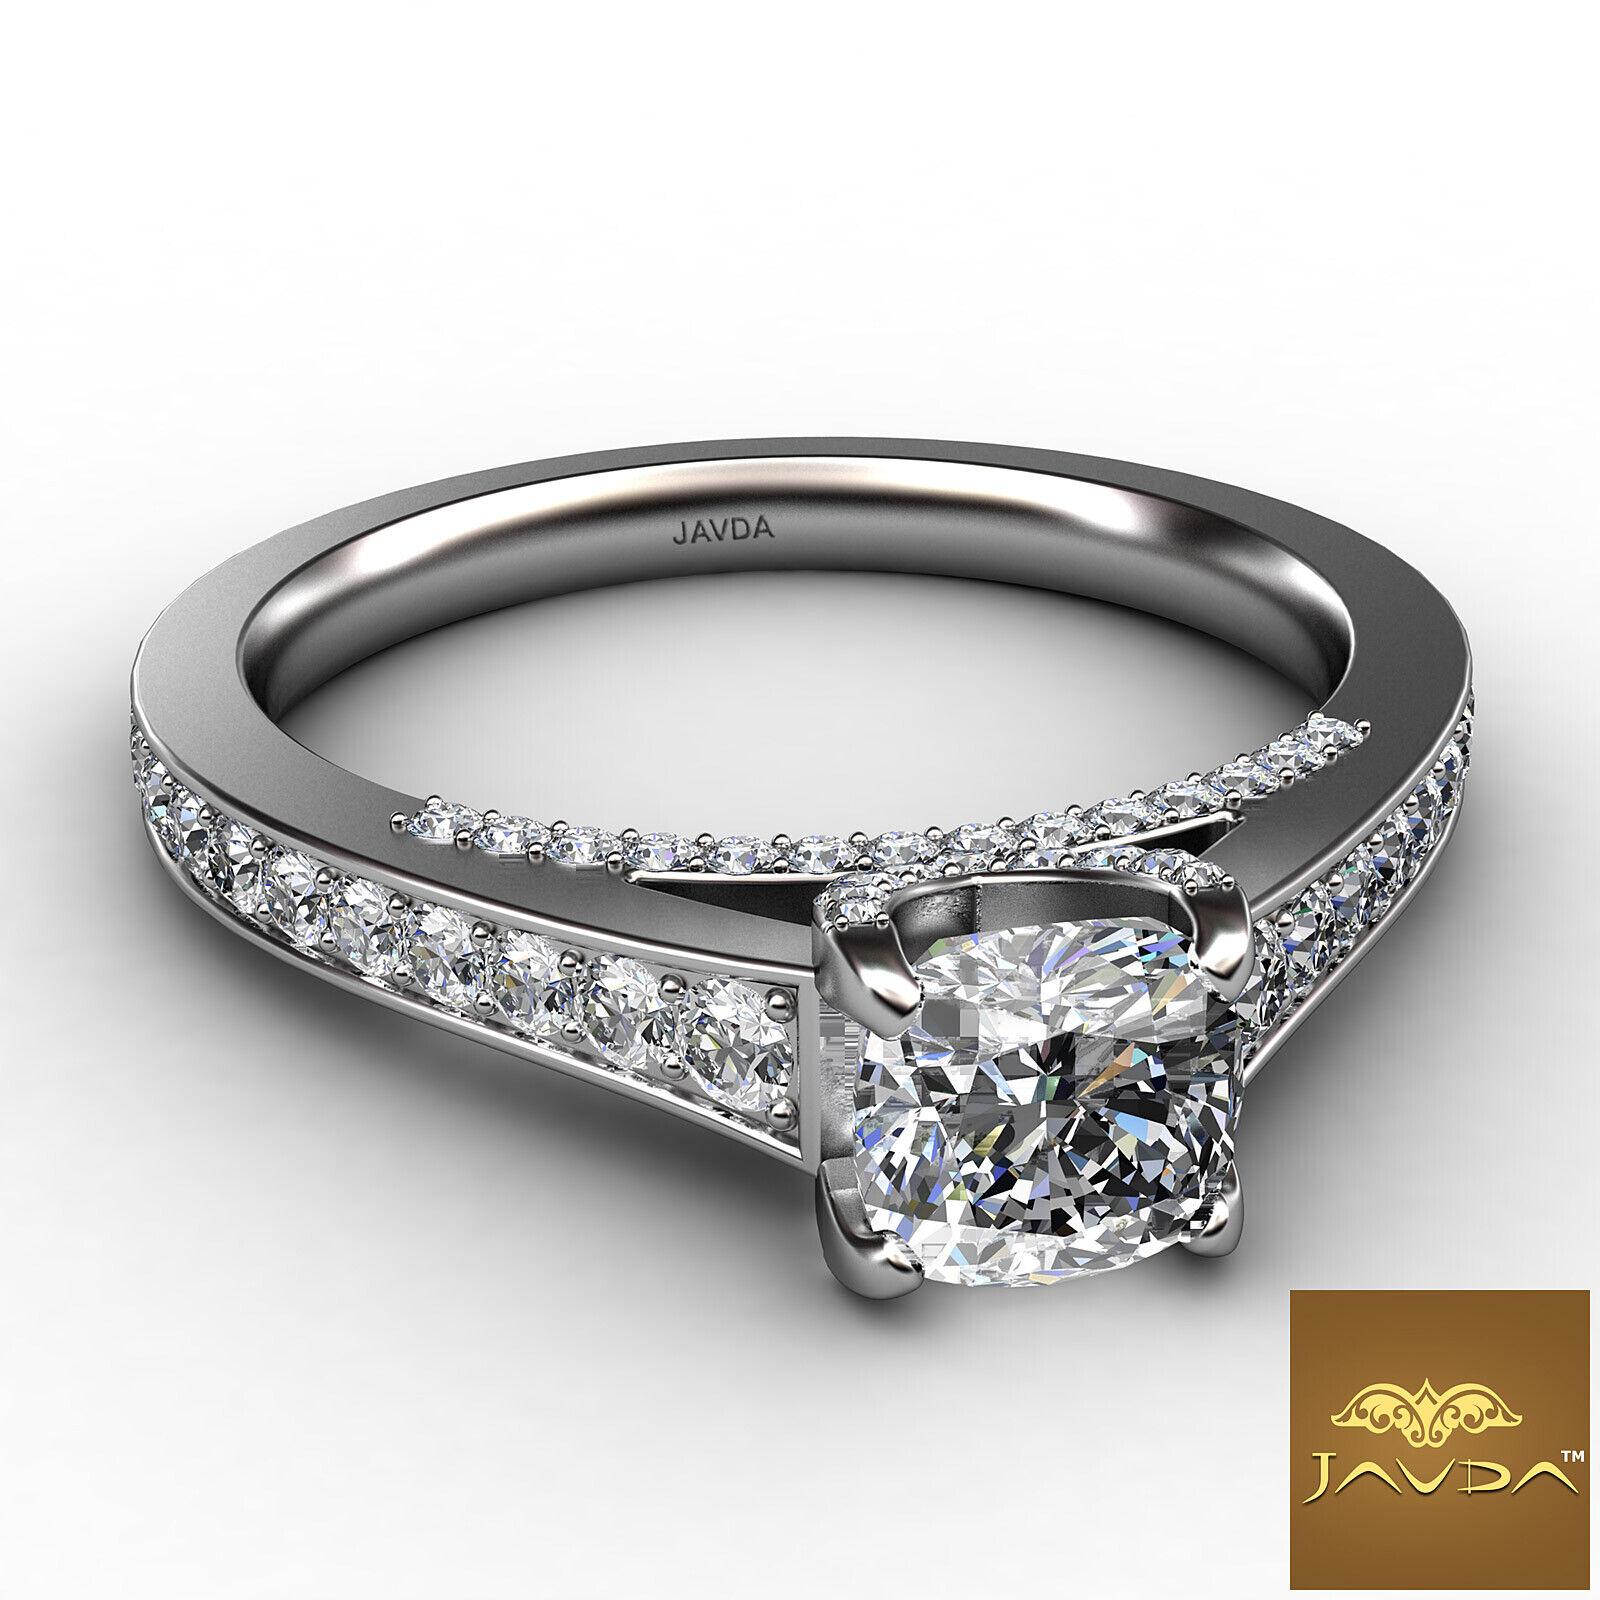 Cushion Cut Diamond Flawless Engagement GIA G VVS2 Pave Set Ring Platinum 1.25Ct 1